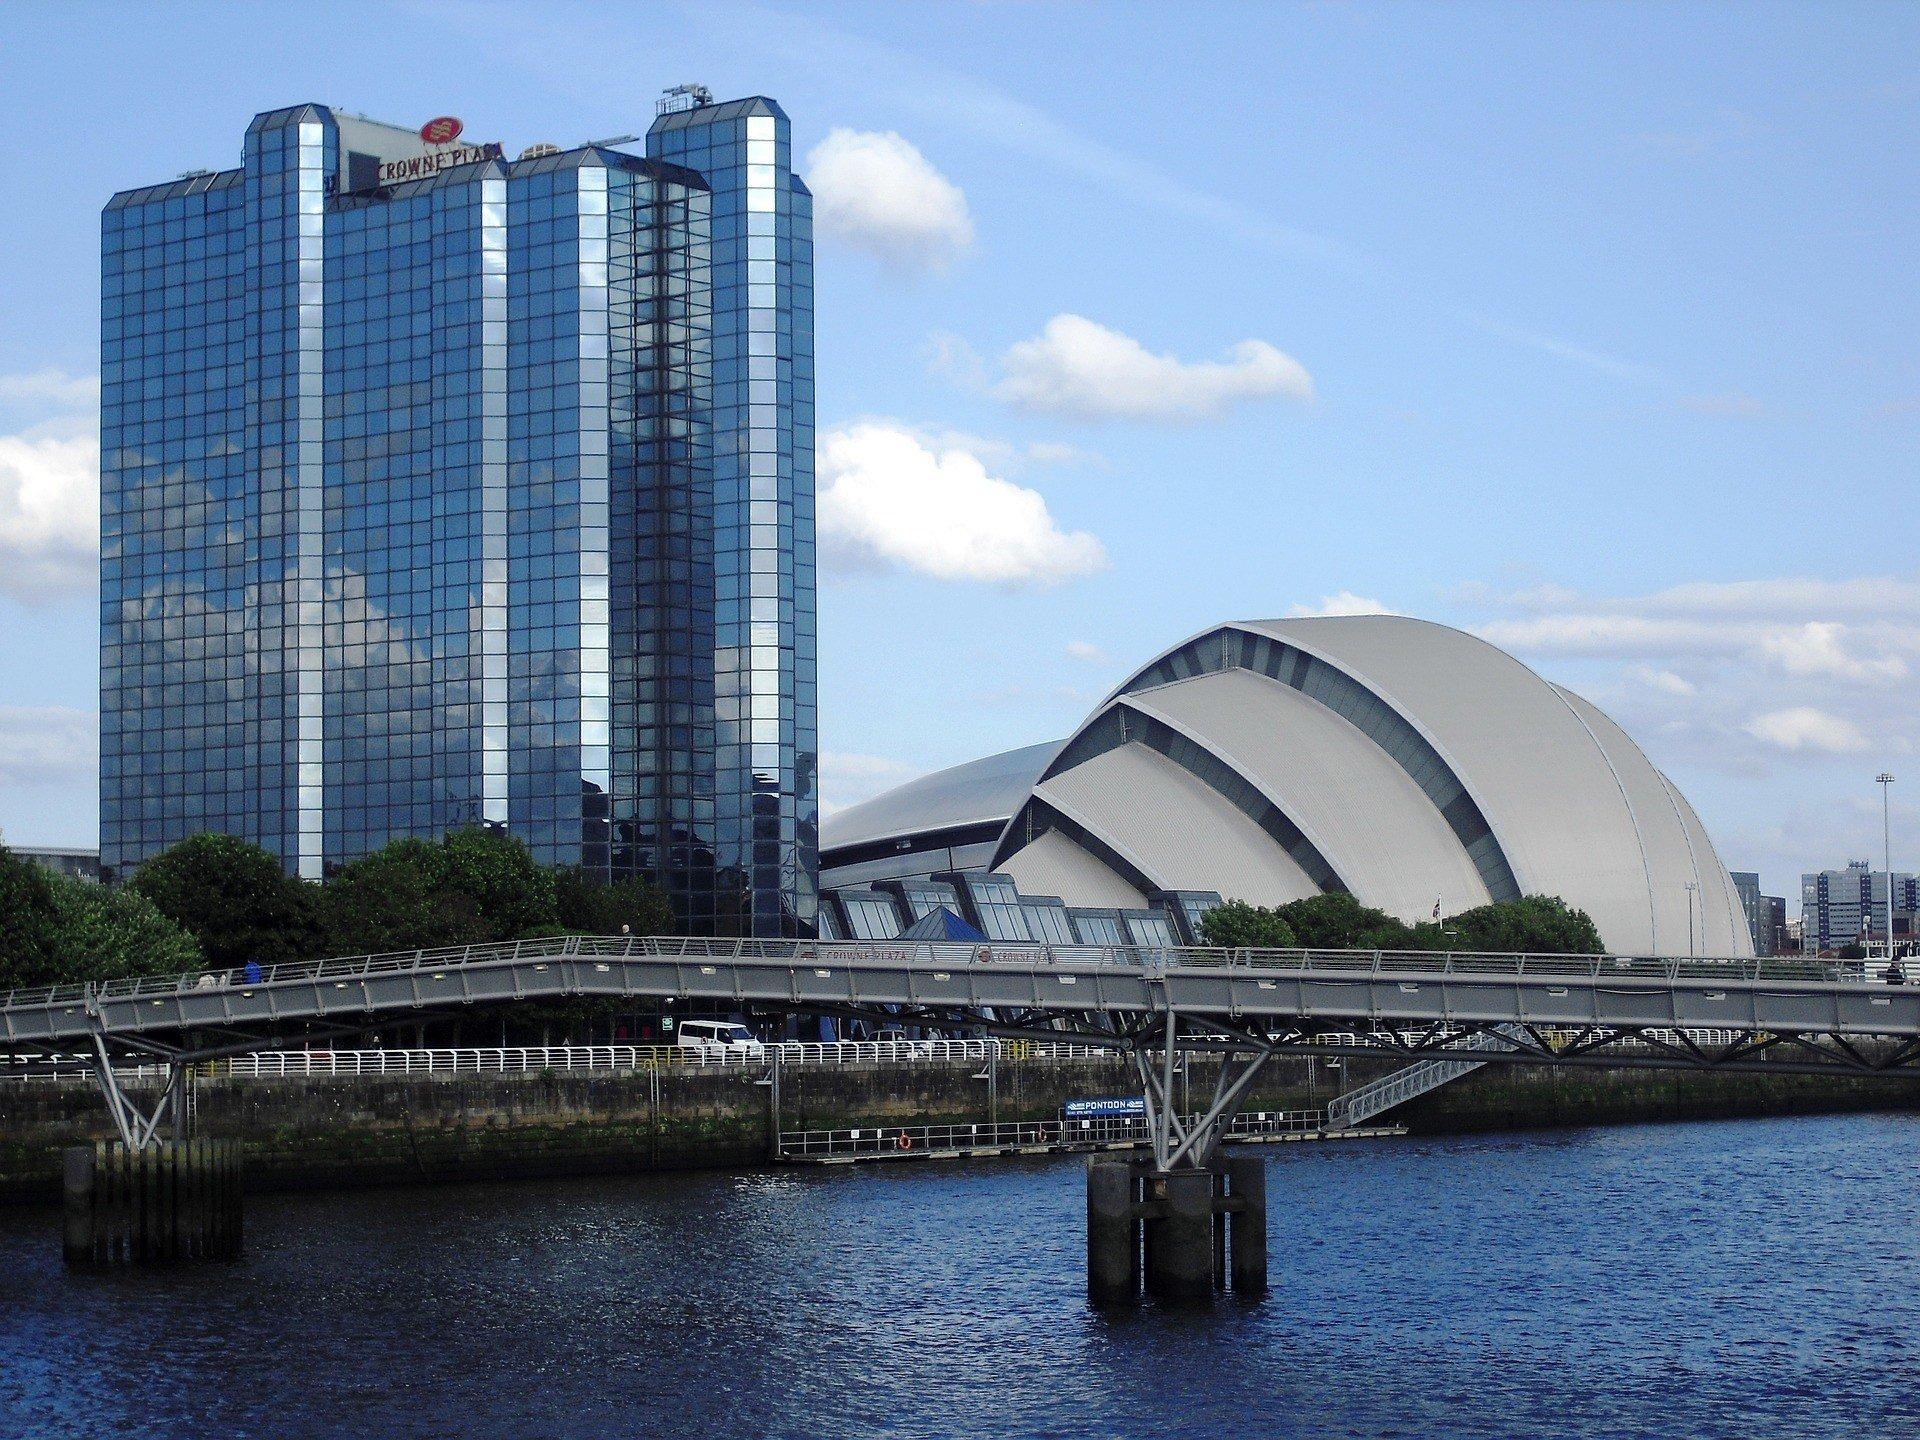 Finnieston, Glasgow